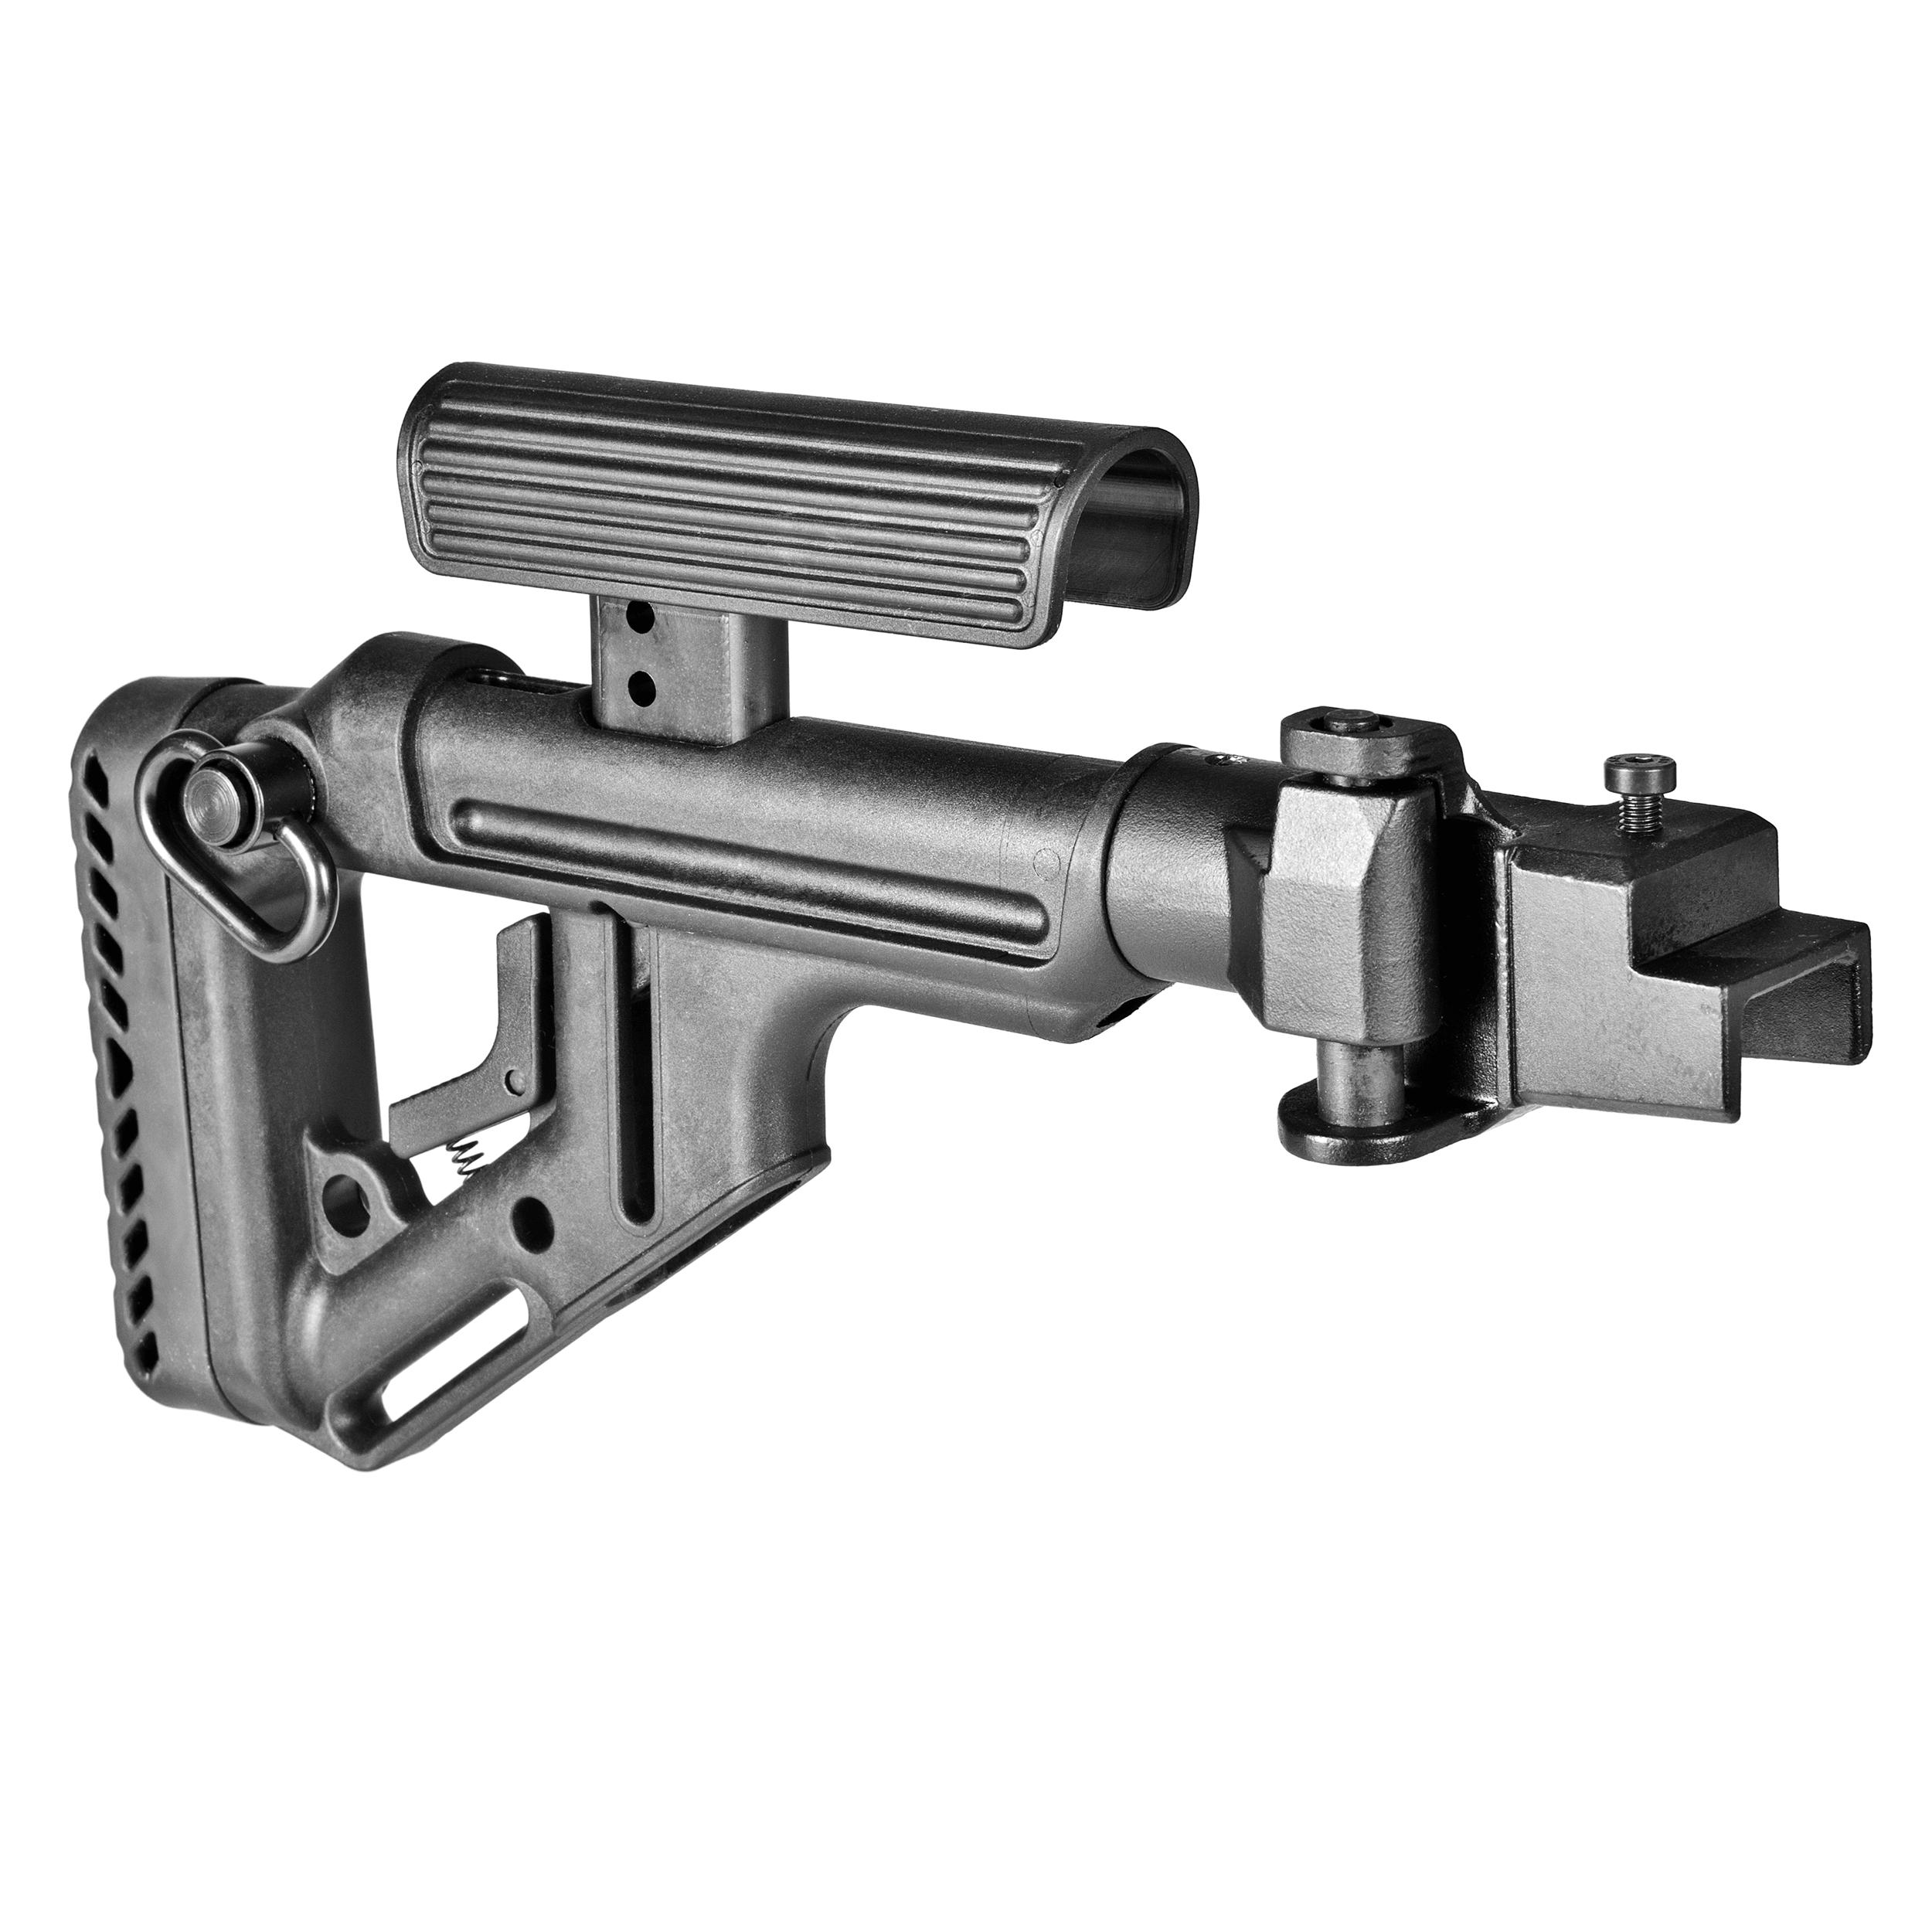 AK47 folding buttstock / cheek rest (Metal Joint)